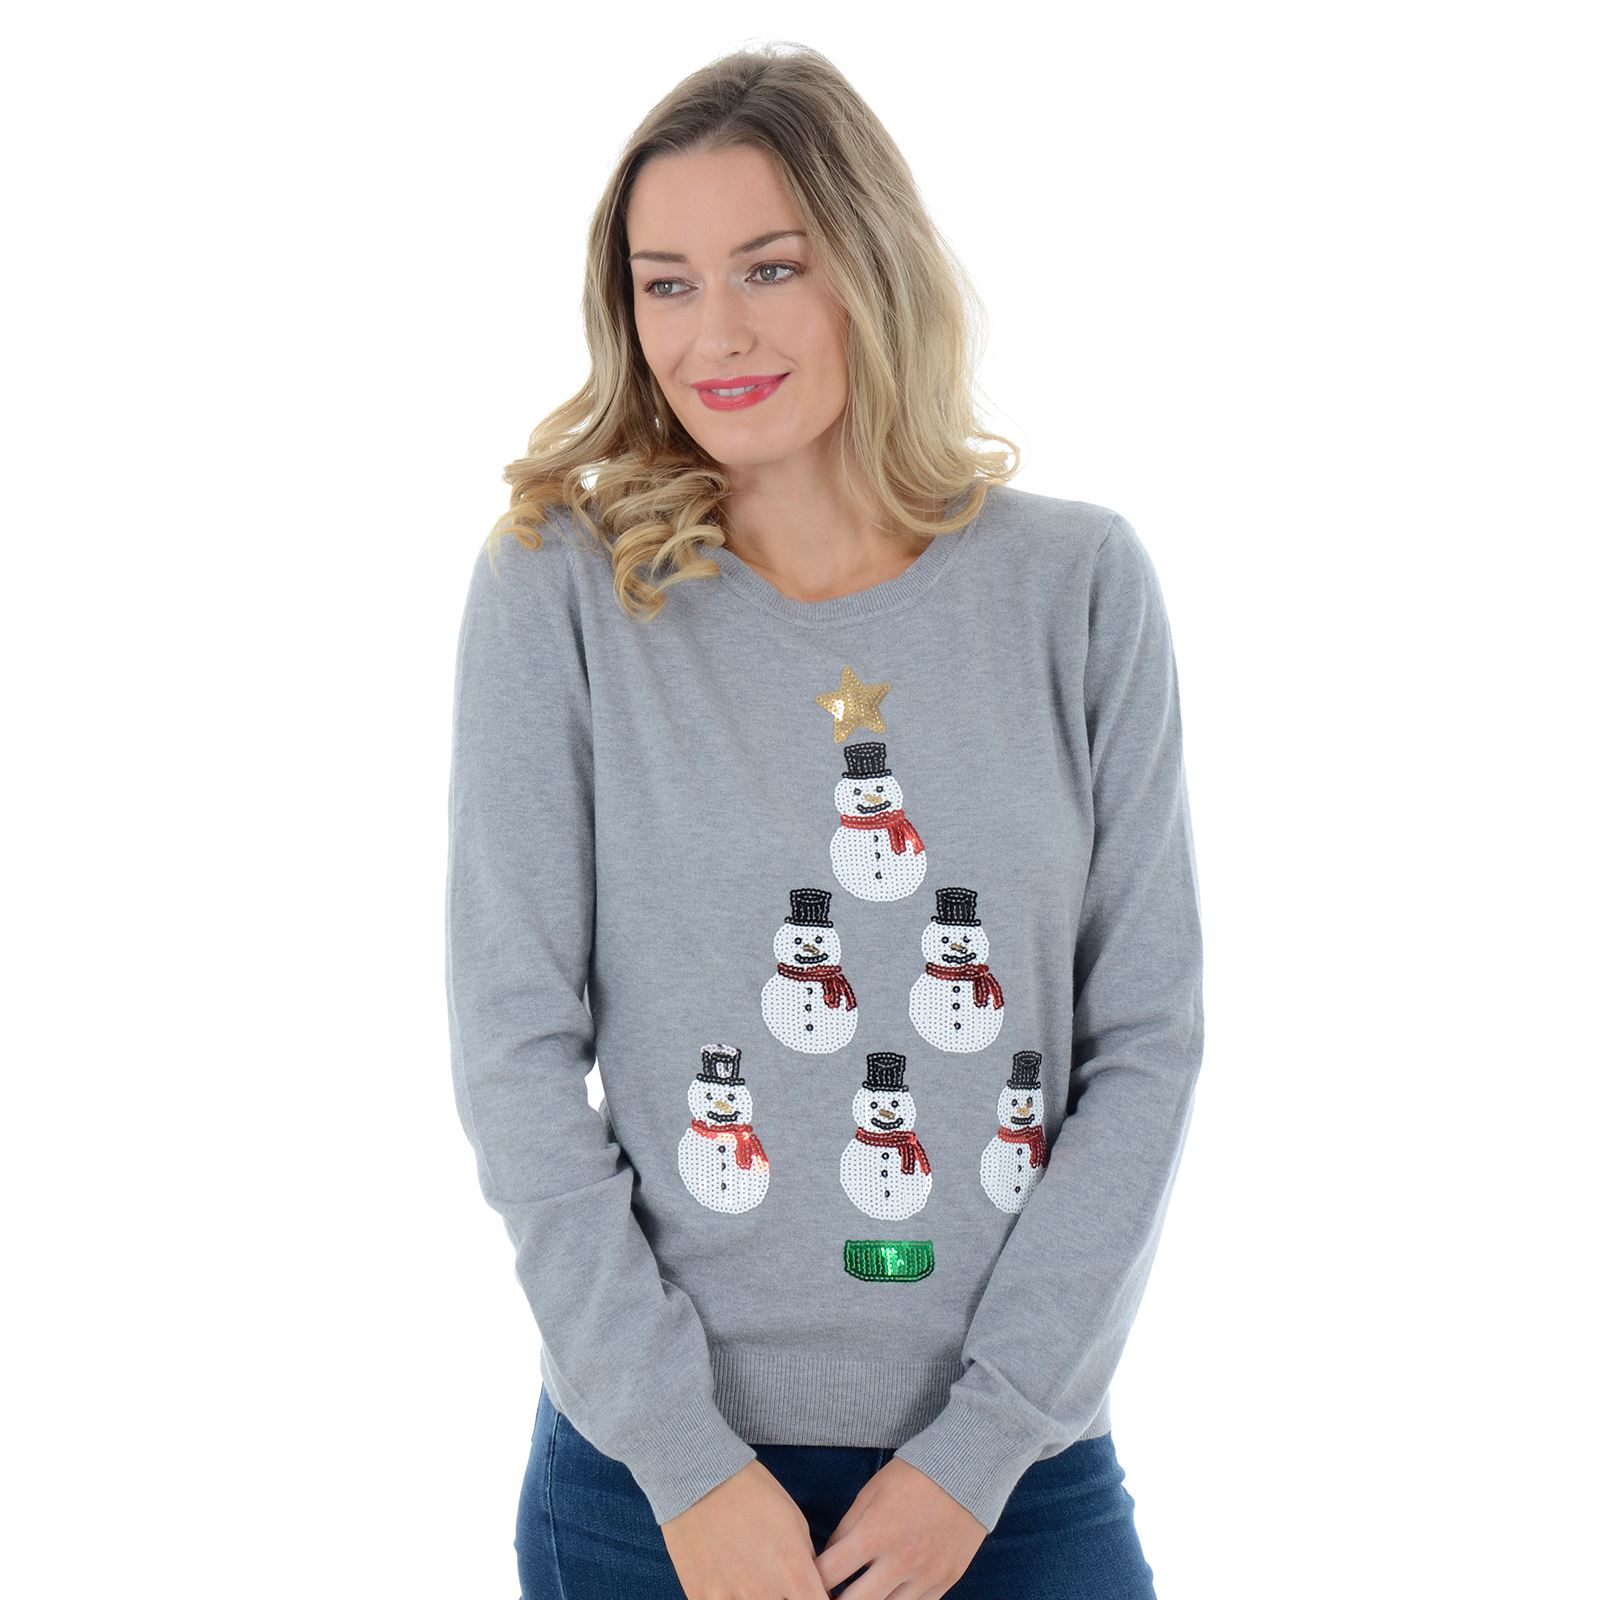 Ladies Womens Novelty Sequins Cute Snowmen Xmas Tree Christmas Jumper Sweater